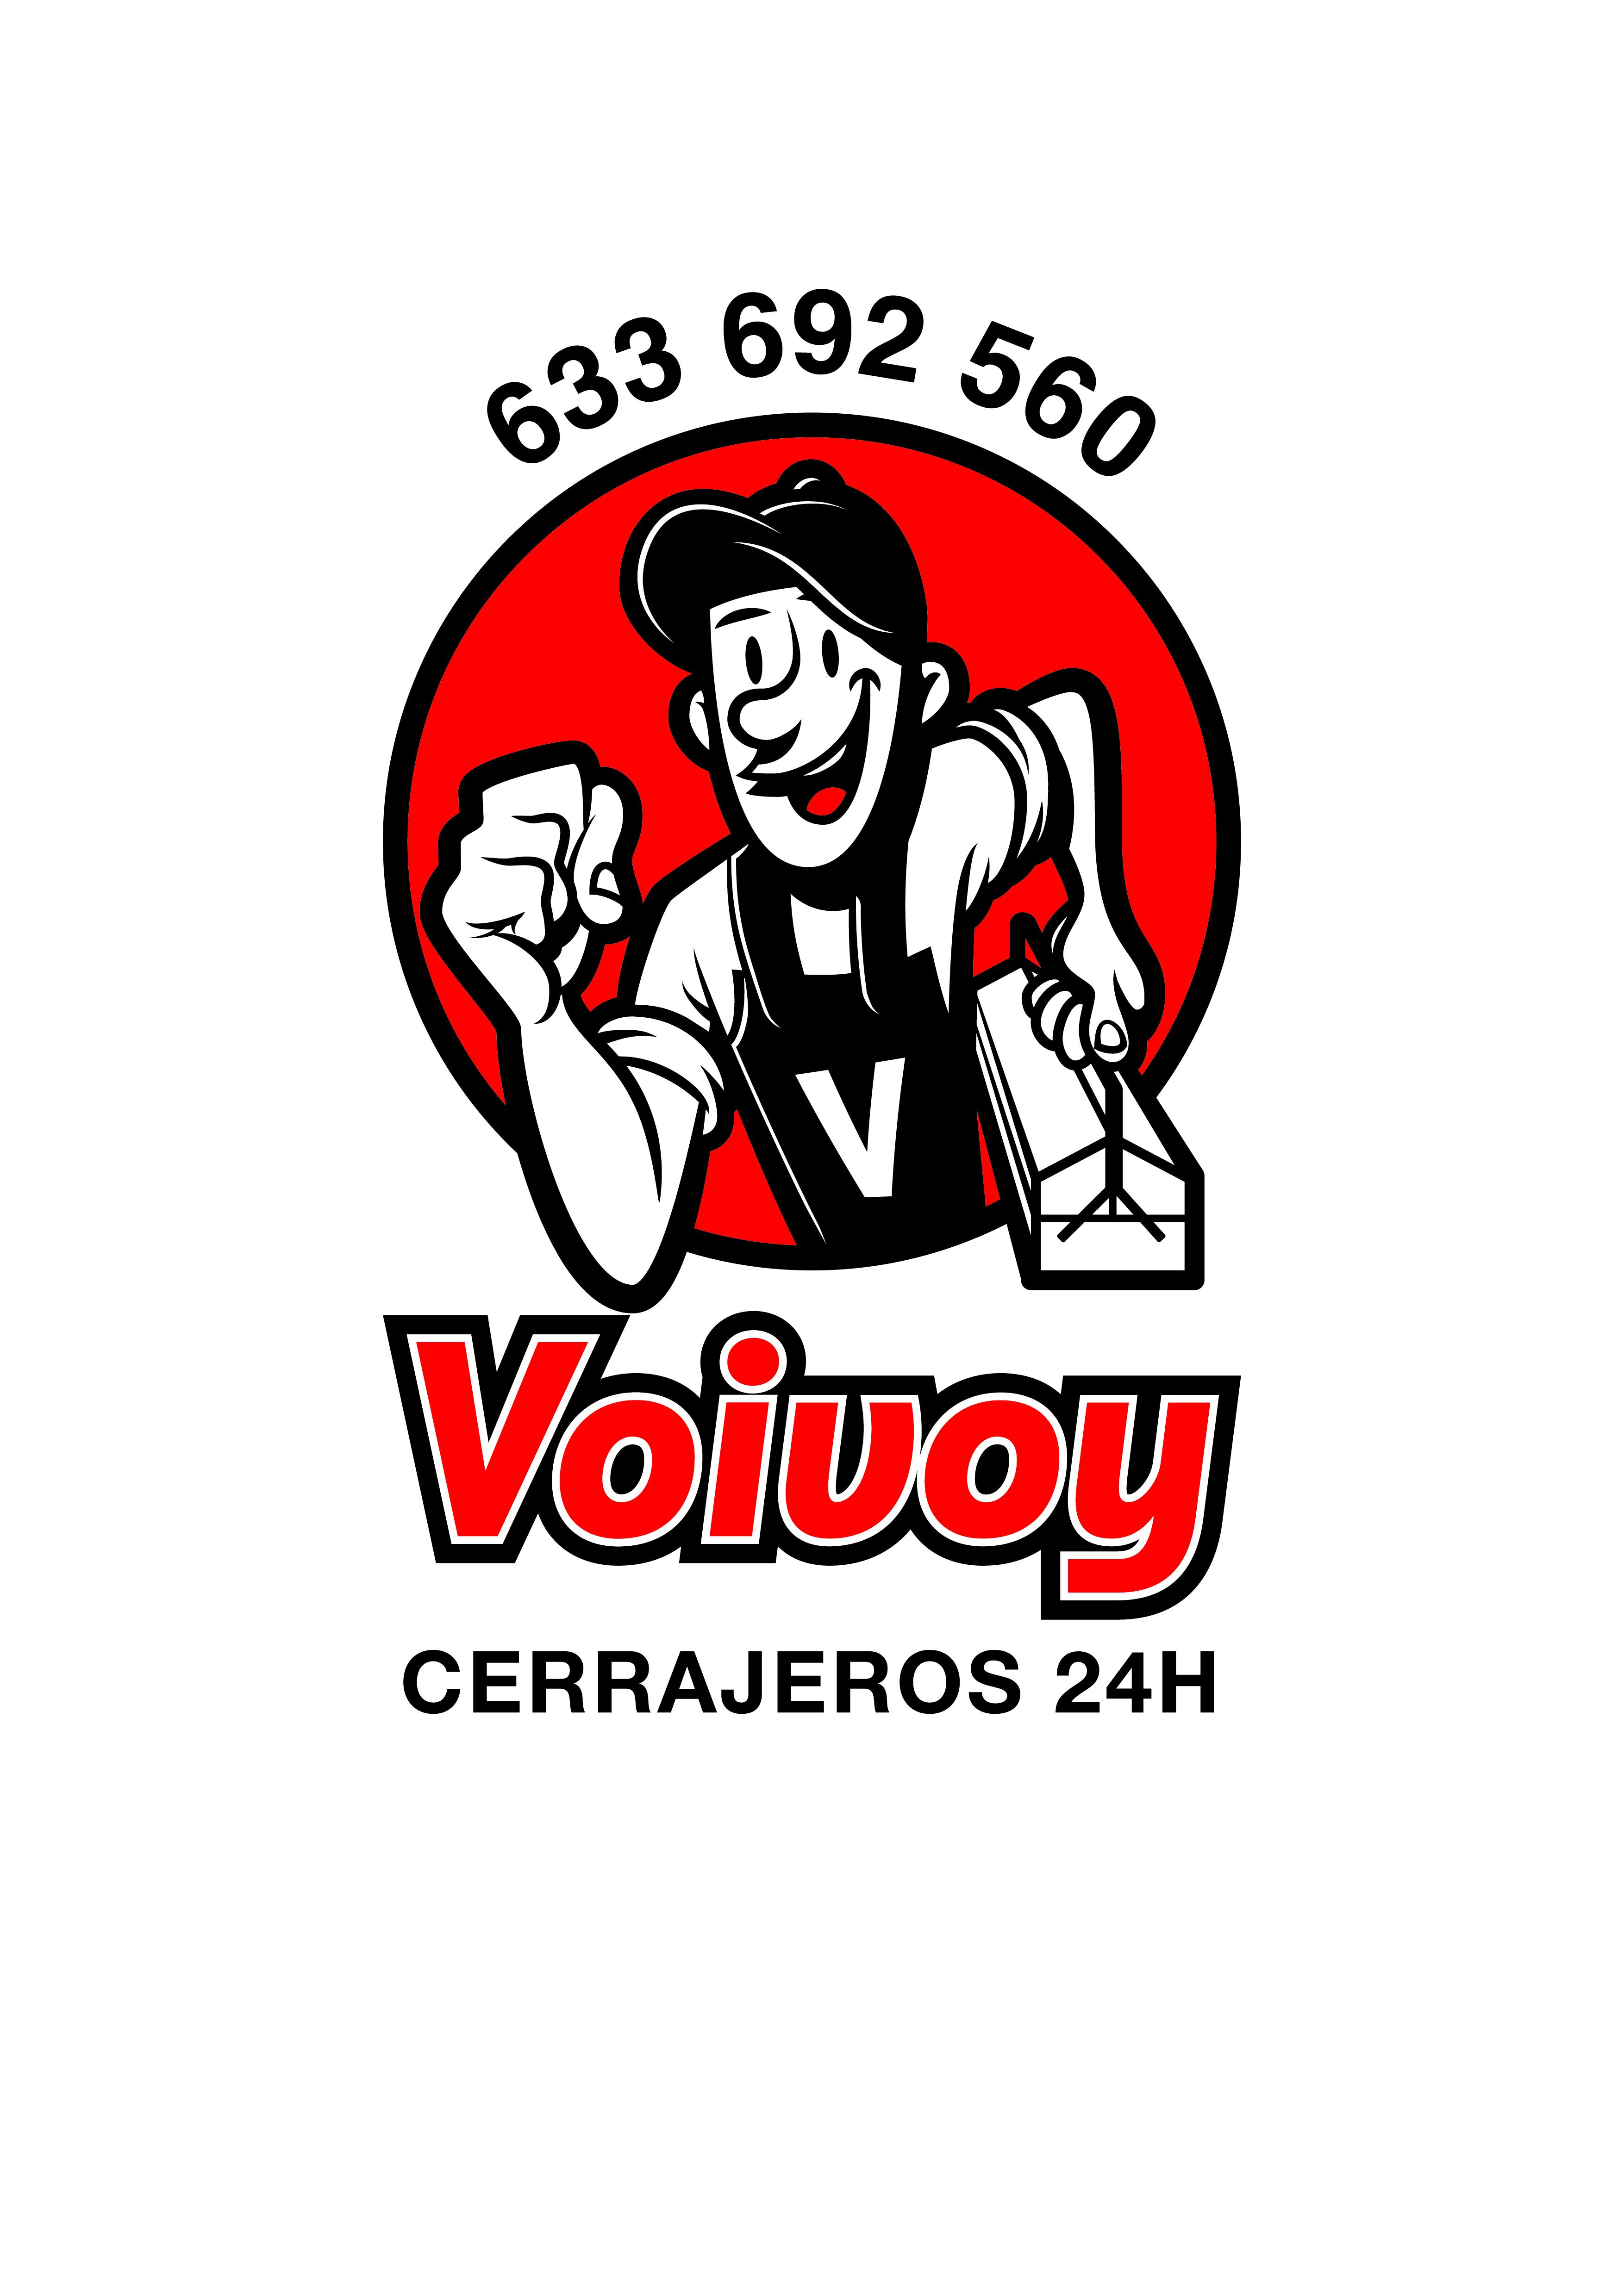 Voivoy Cerrajeros Murcia CERRAJEROS